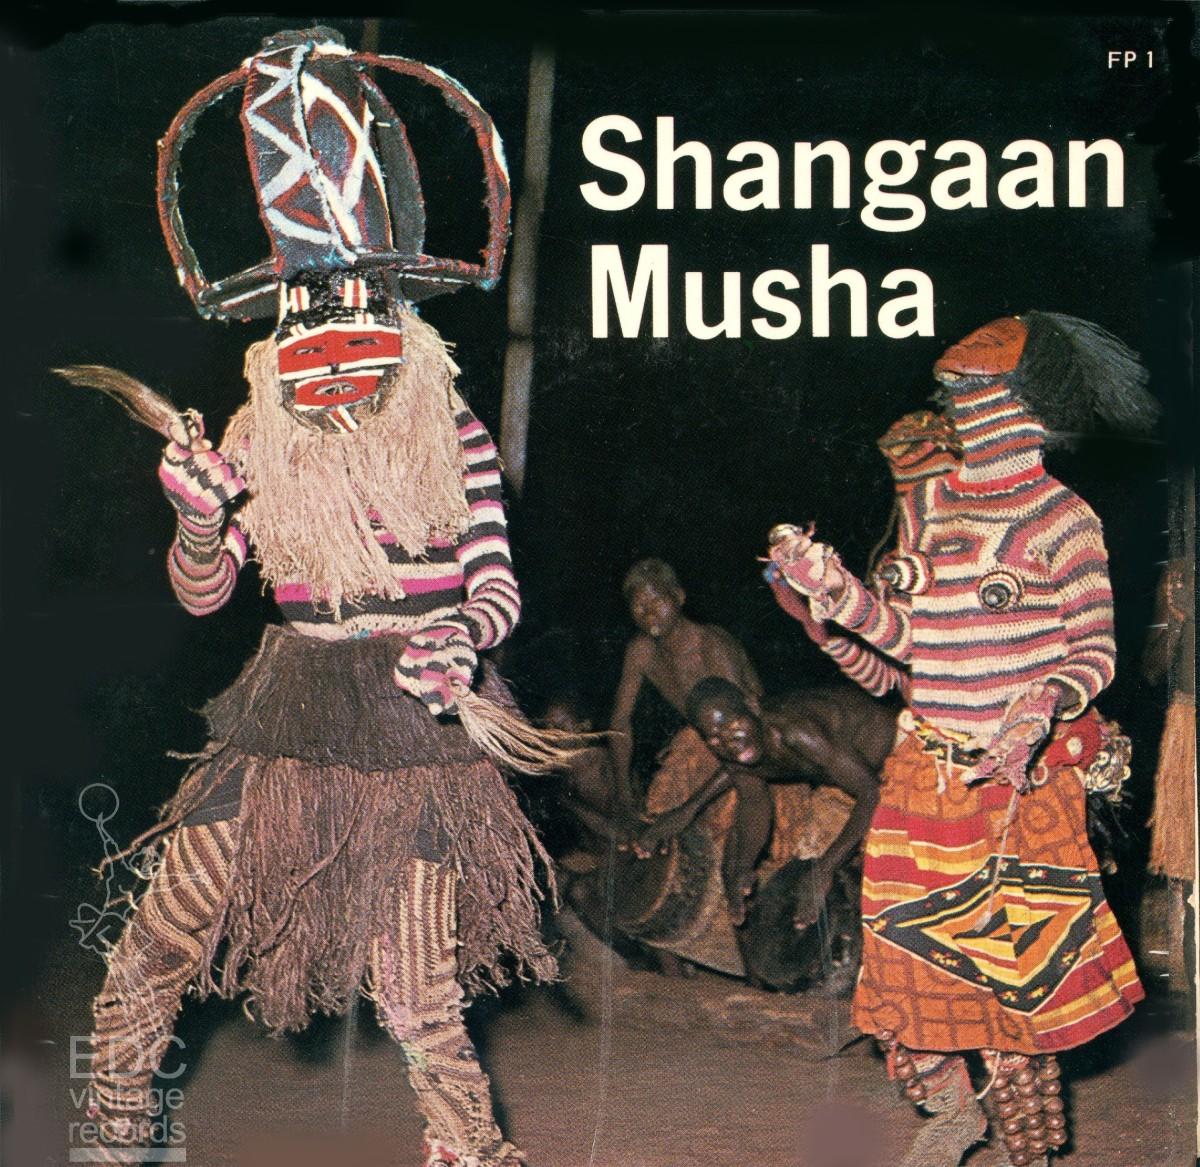 Shangaan Musha: Mambuaulela Makhubela & his Shangaan Drums Dancers performing in Park Station, South Africa